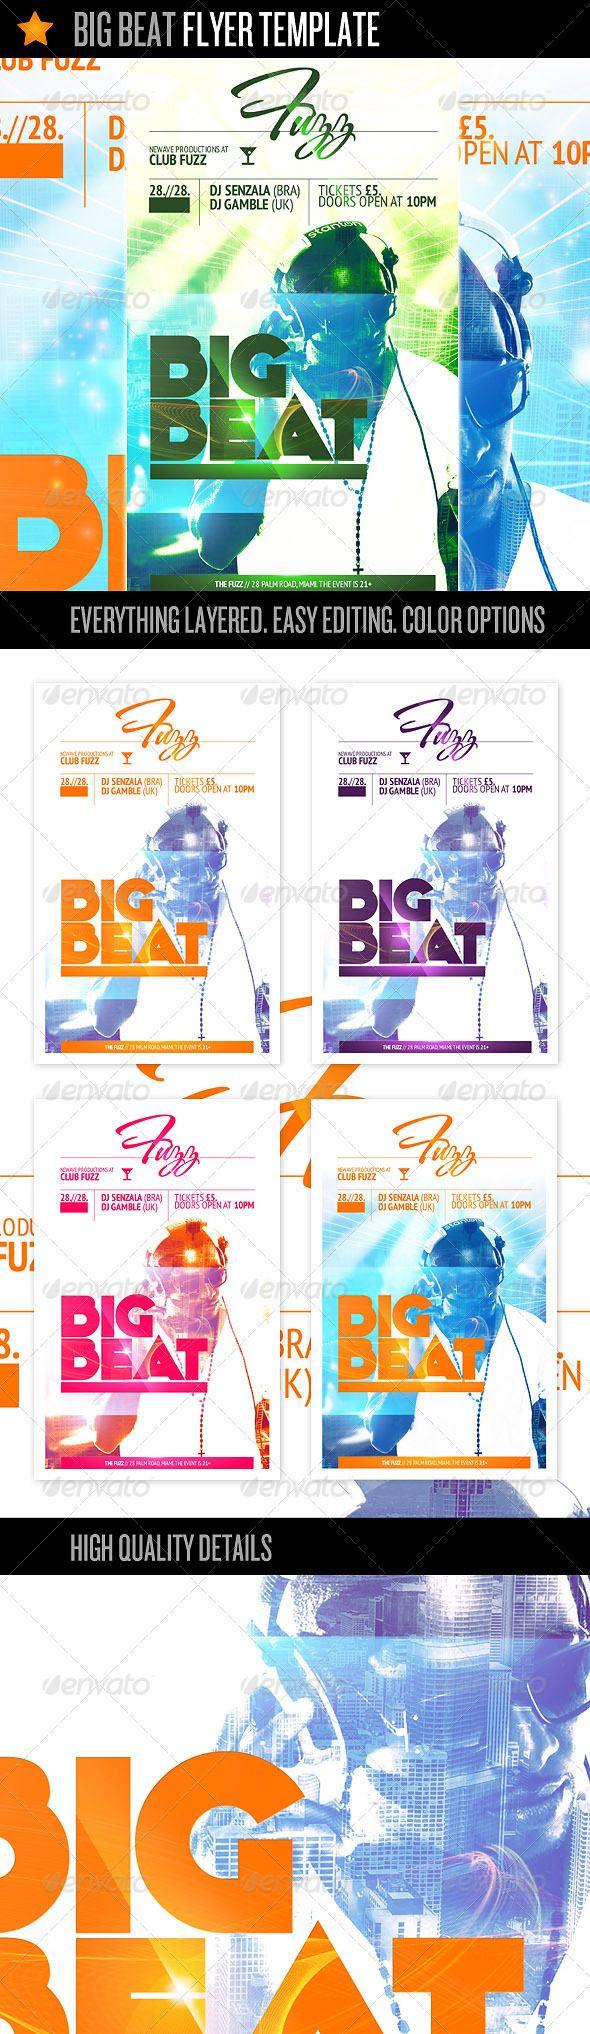 Big Beat - Flyer Template